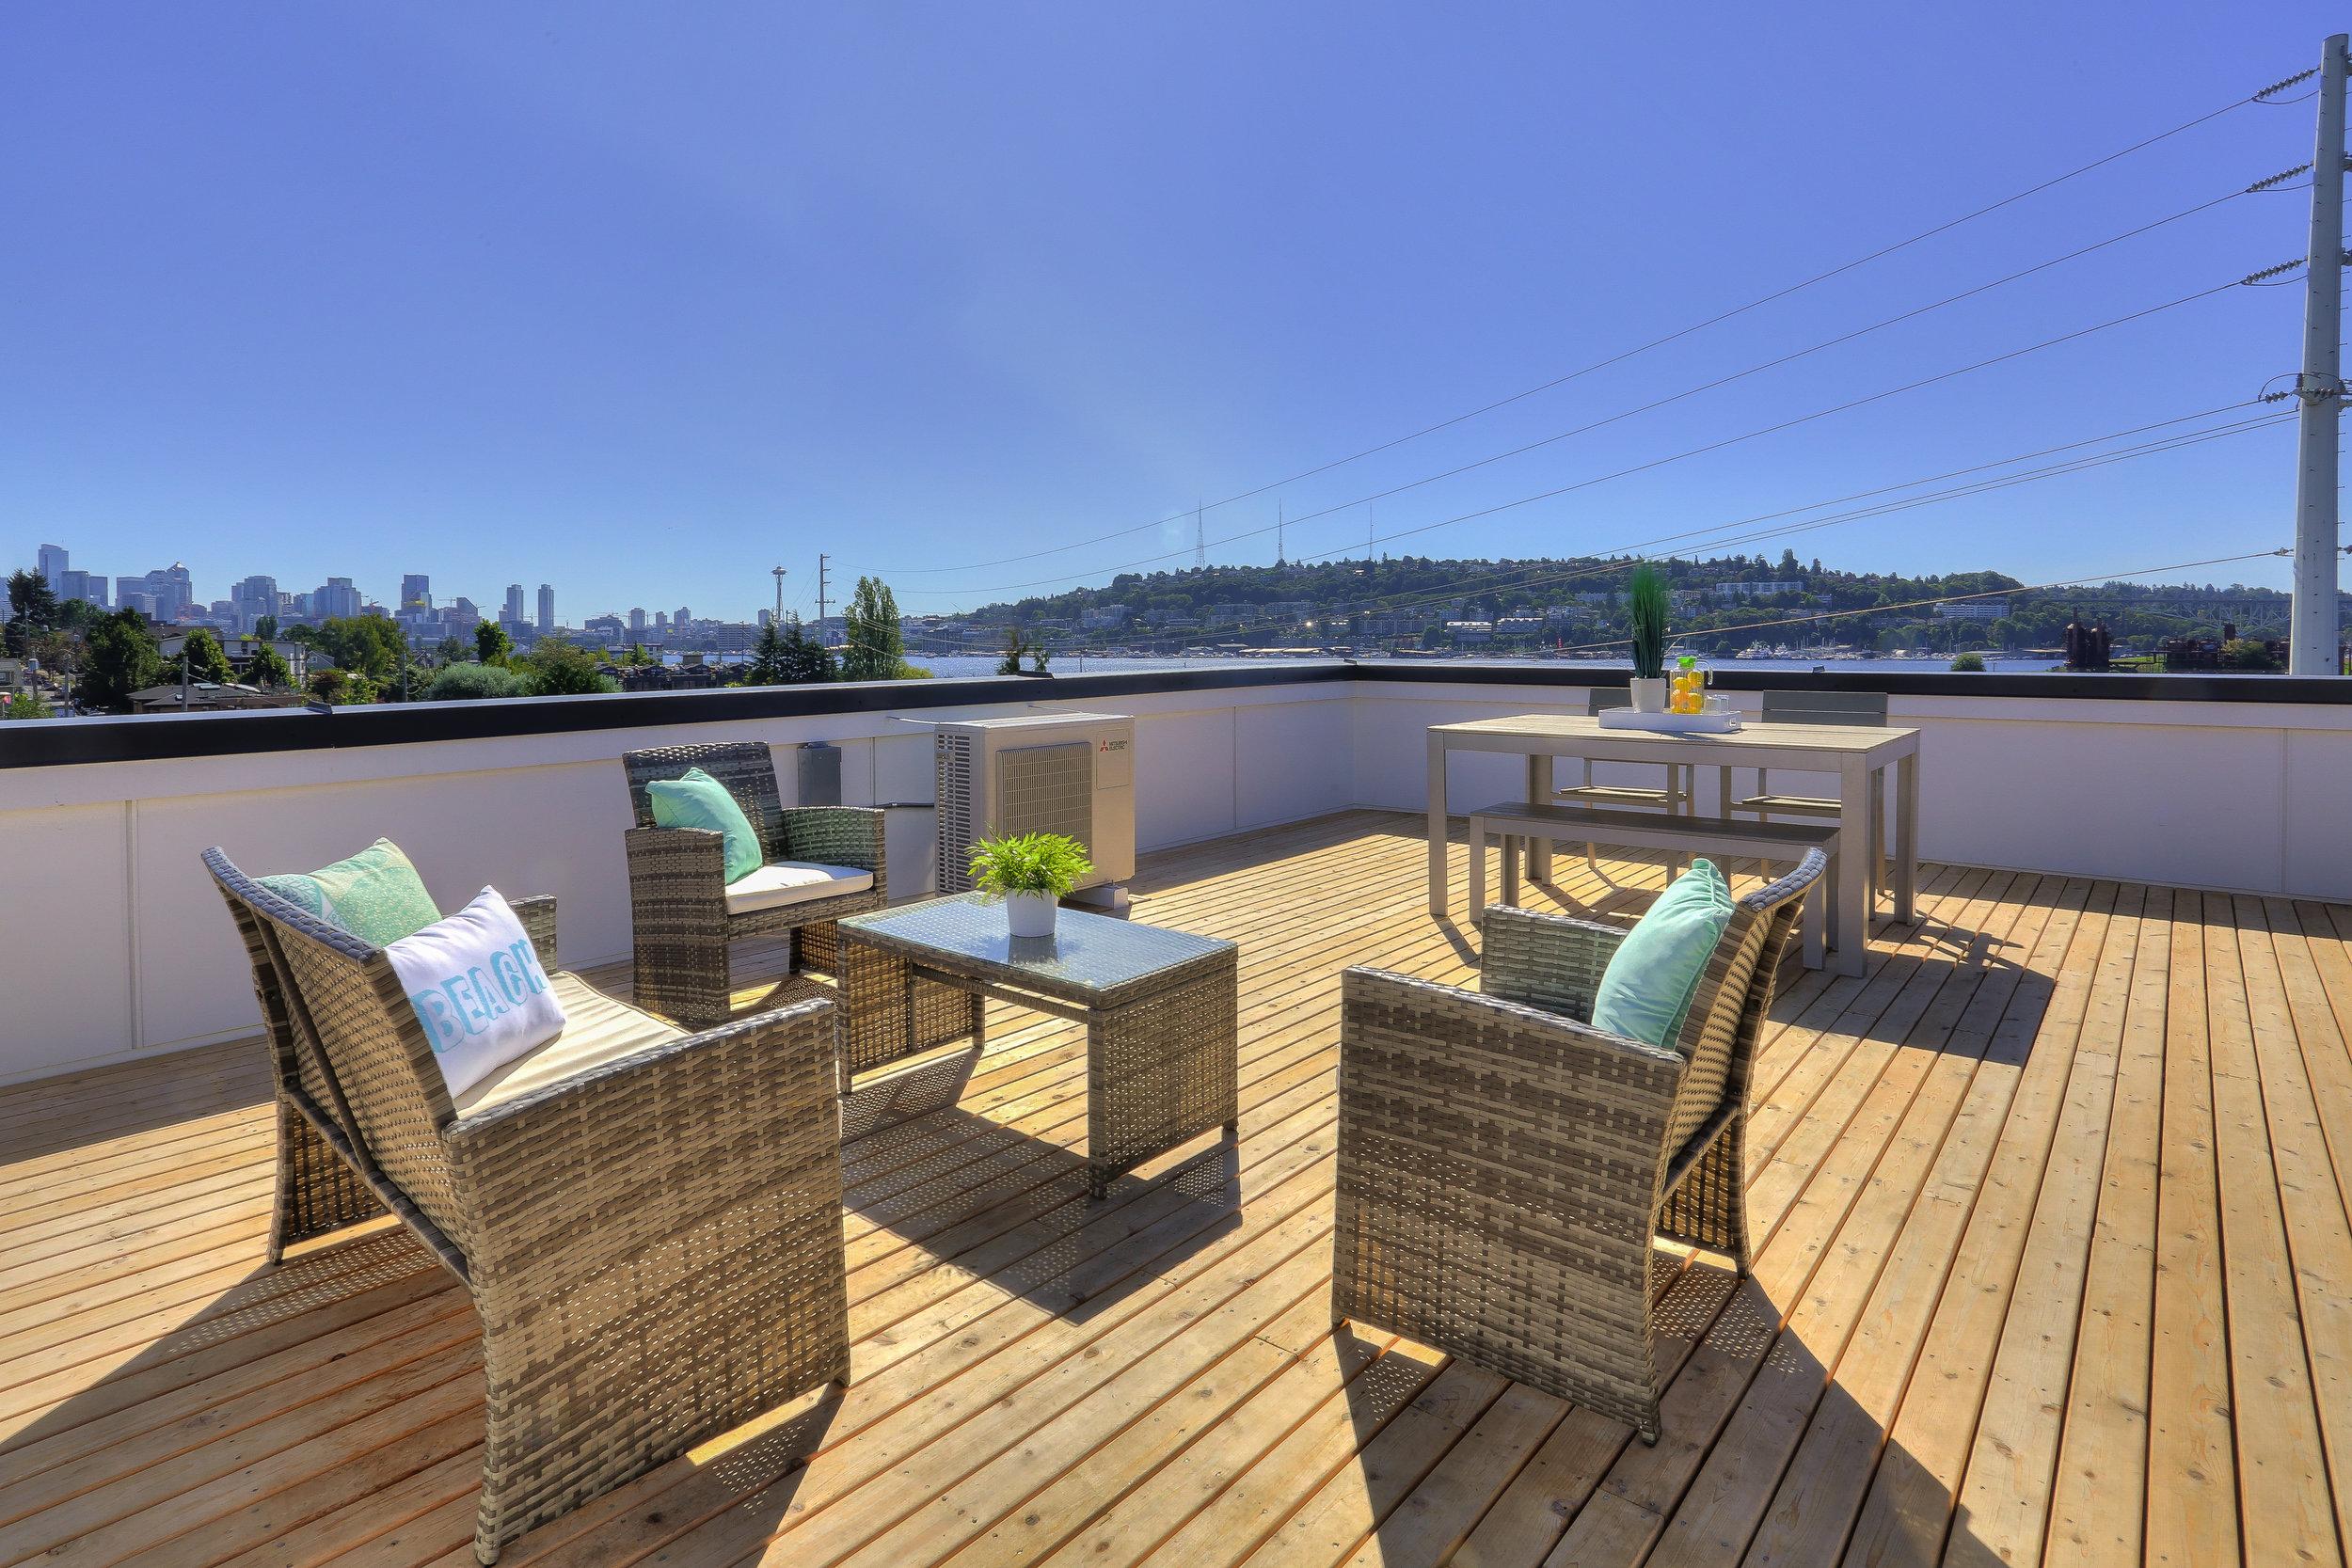 Expansive Rooftop Decks